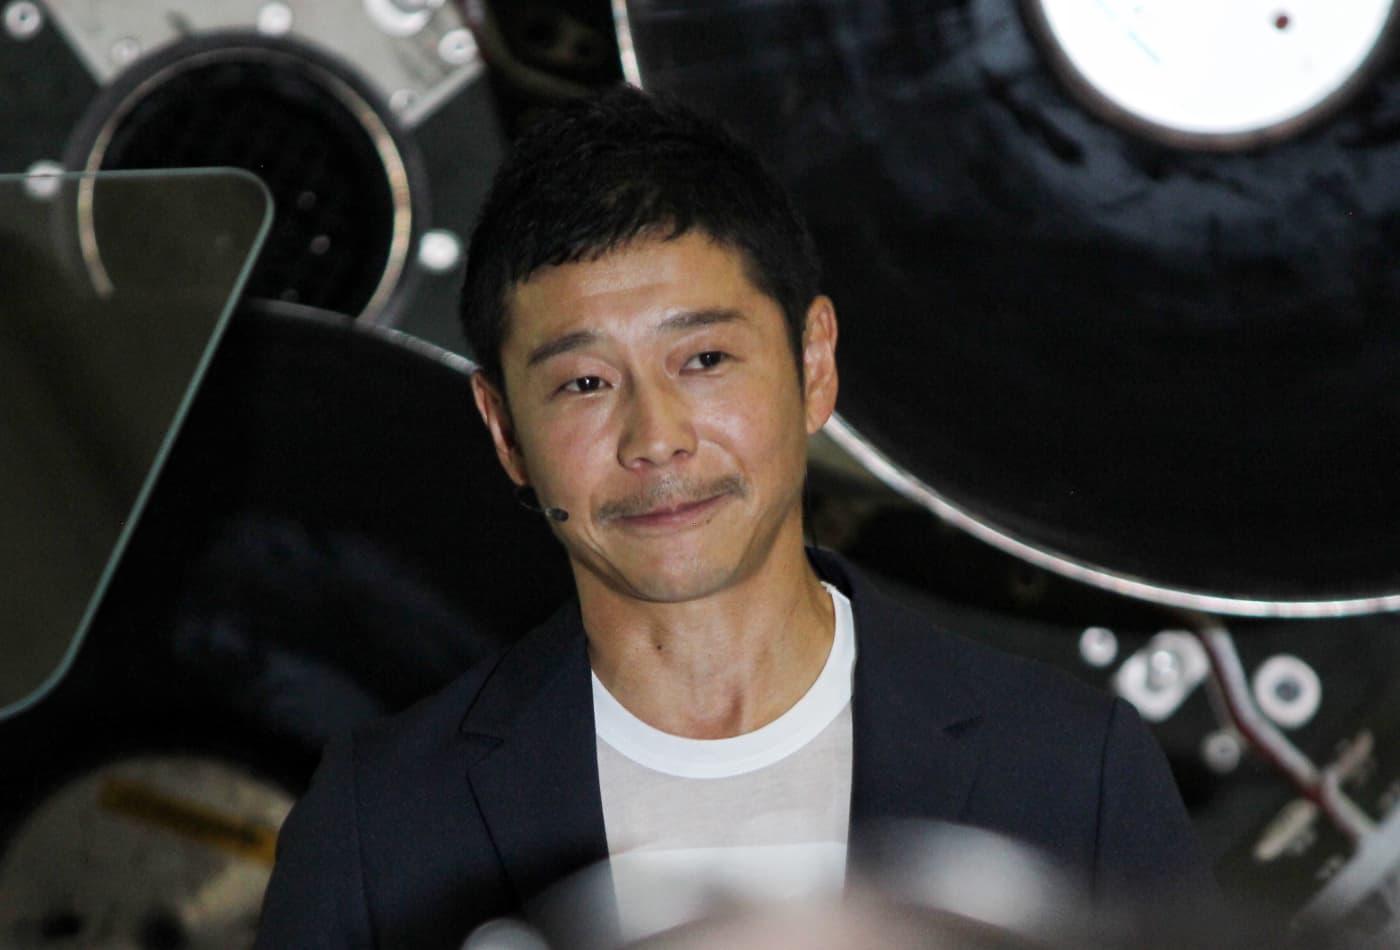 Billionaire Yusaku Maezawa launches entrepreneur competition offering to invest $91 million